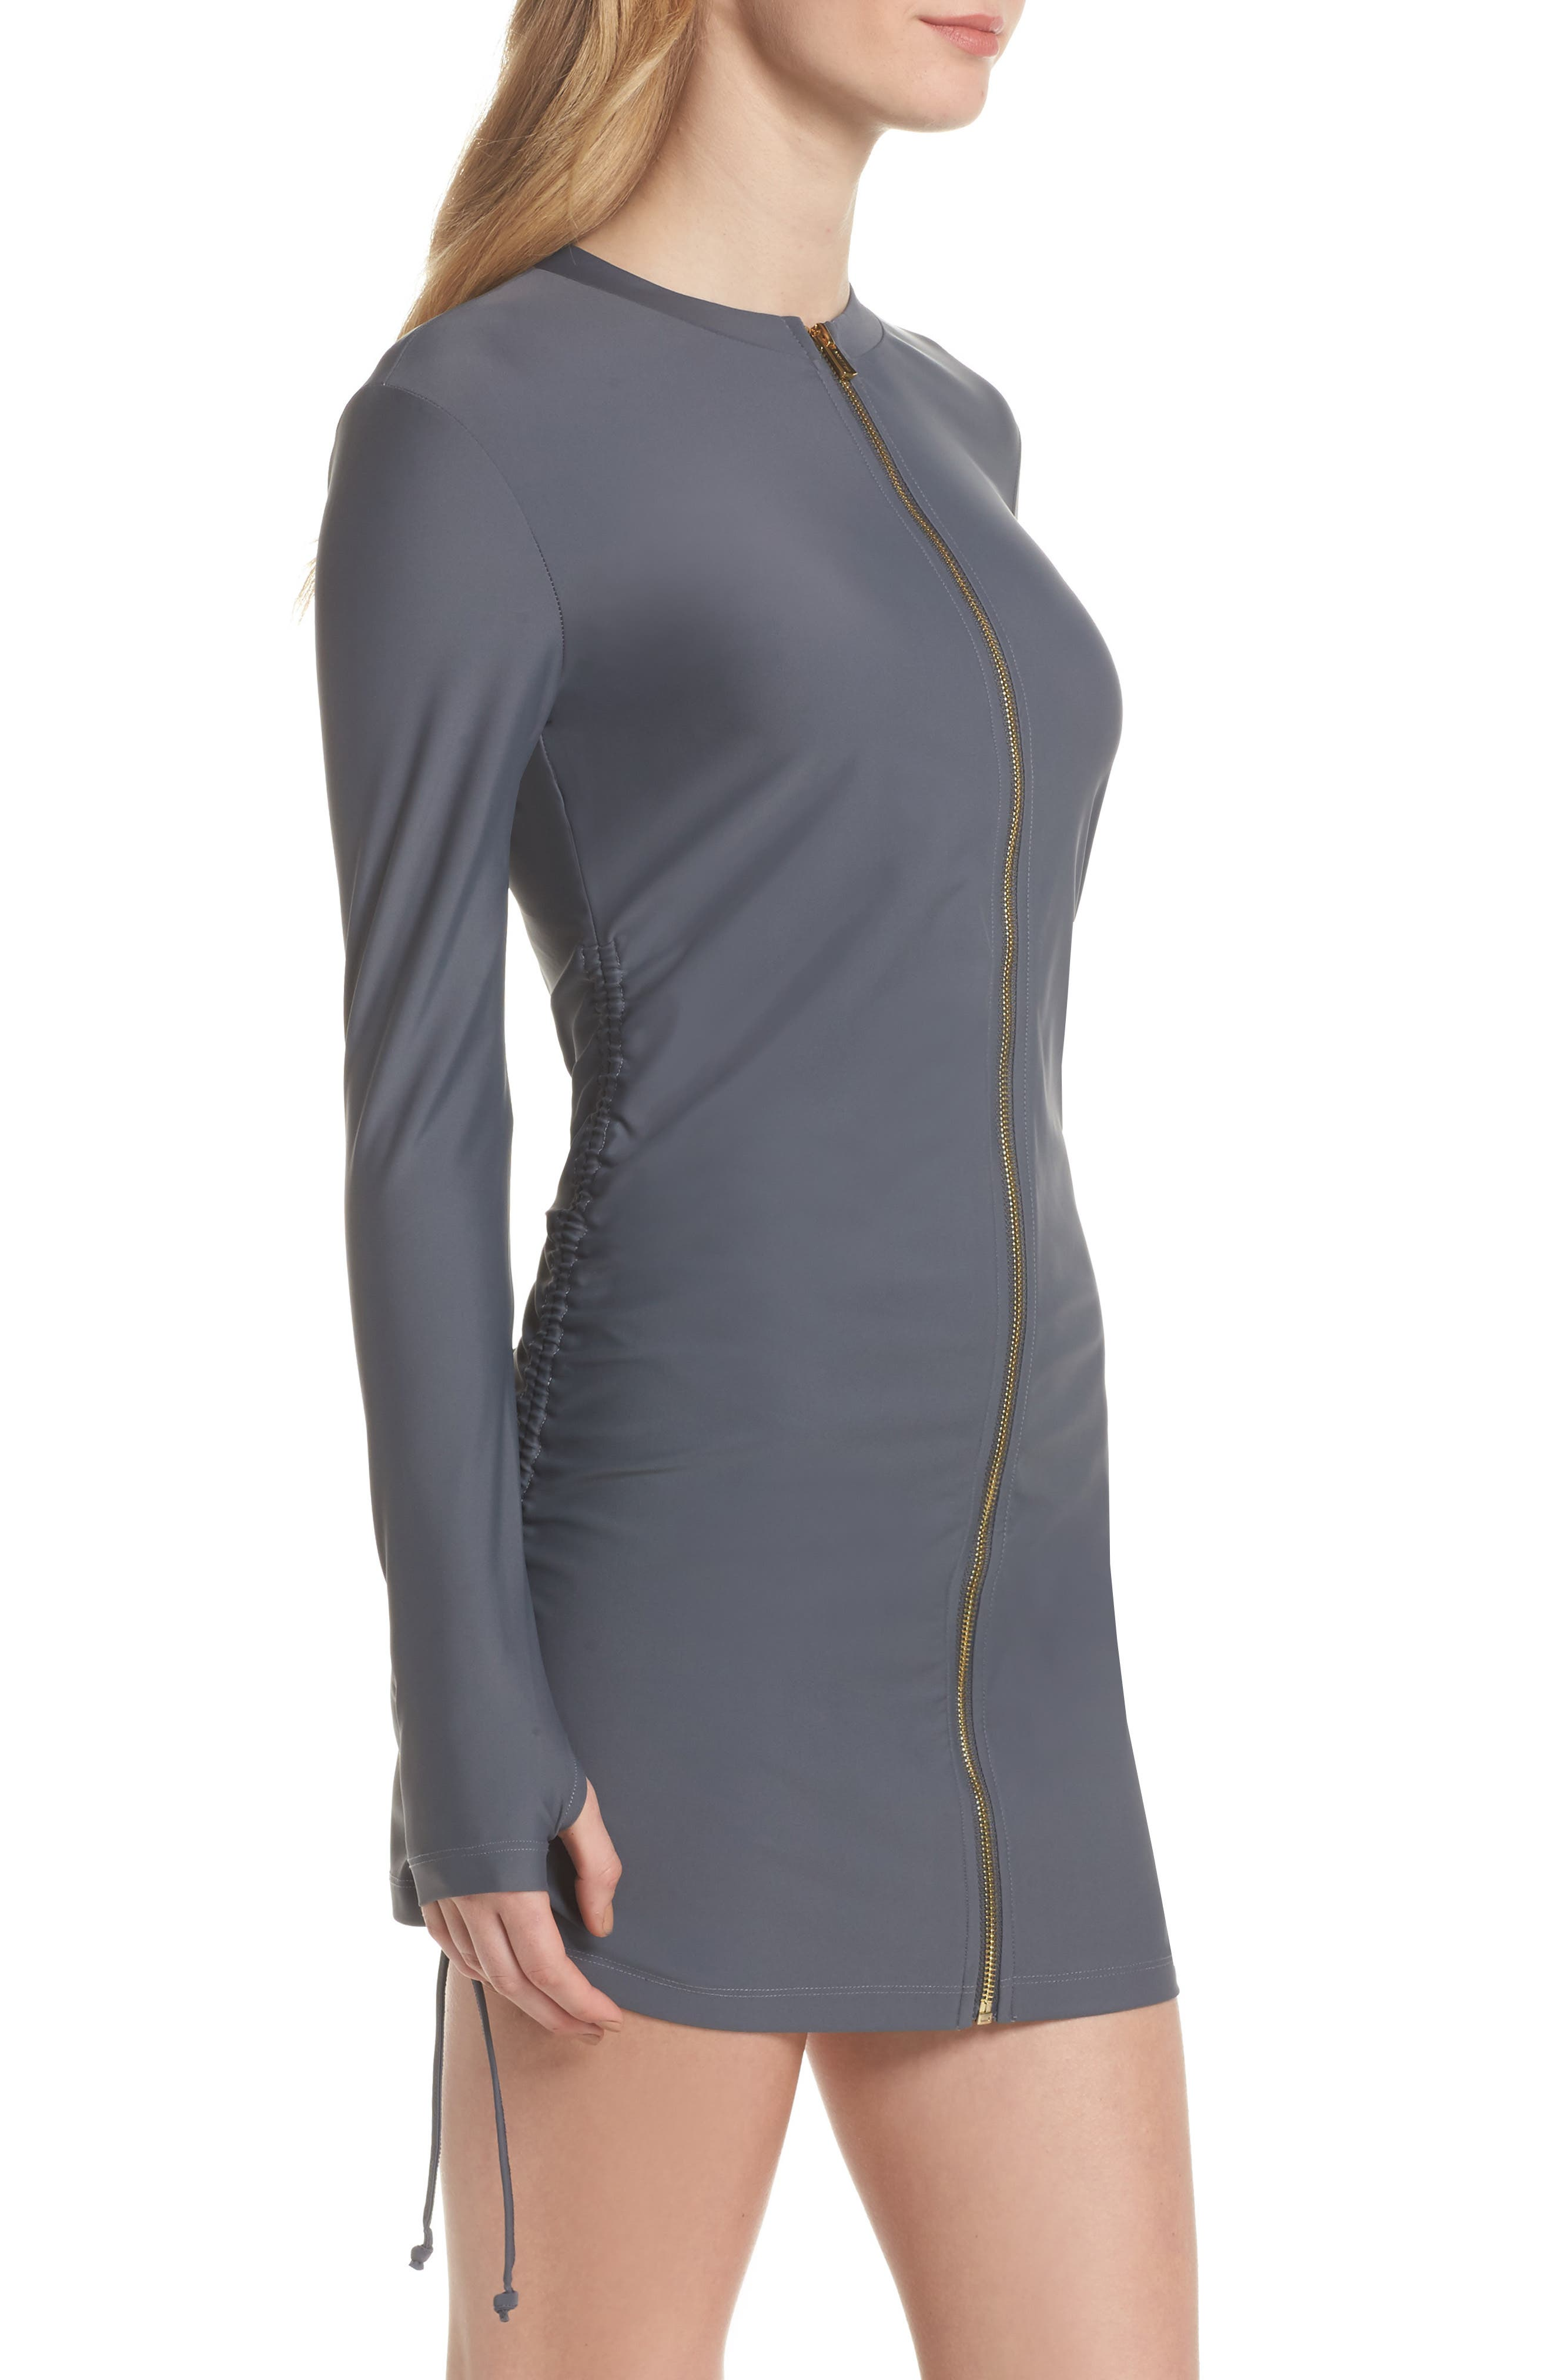 Zip Cover-Up Swim Dress,                             Alternate thumbnail 3, color,                             Grey